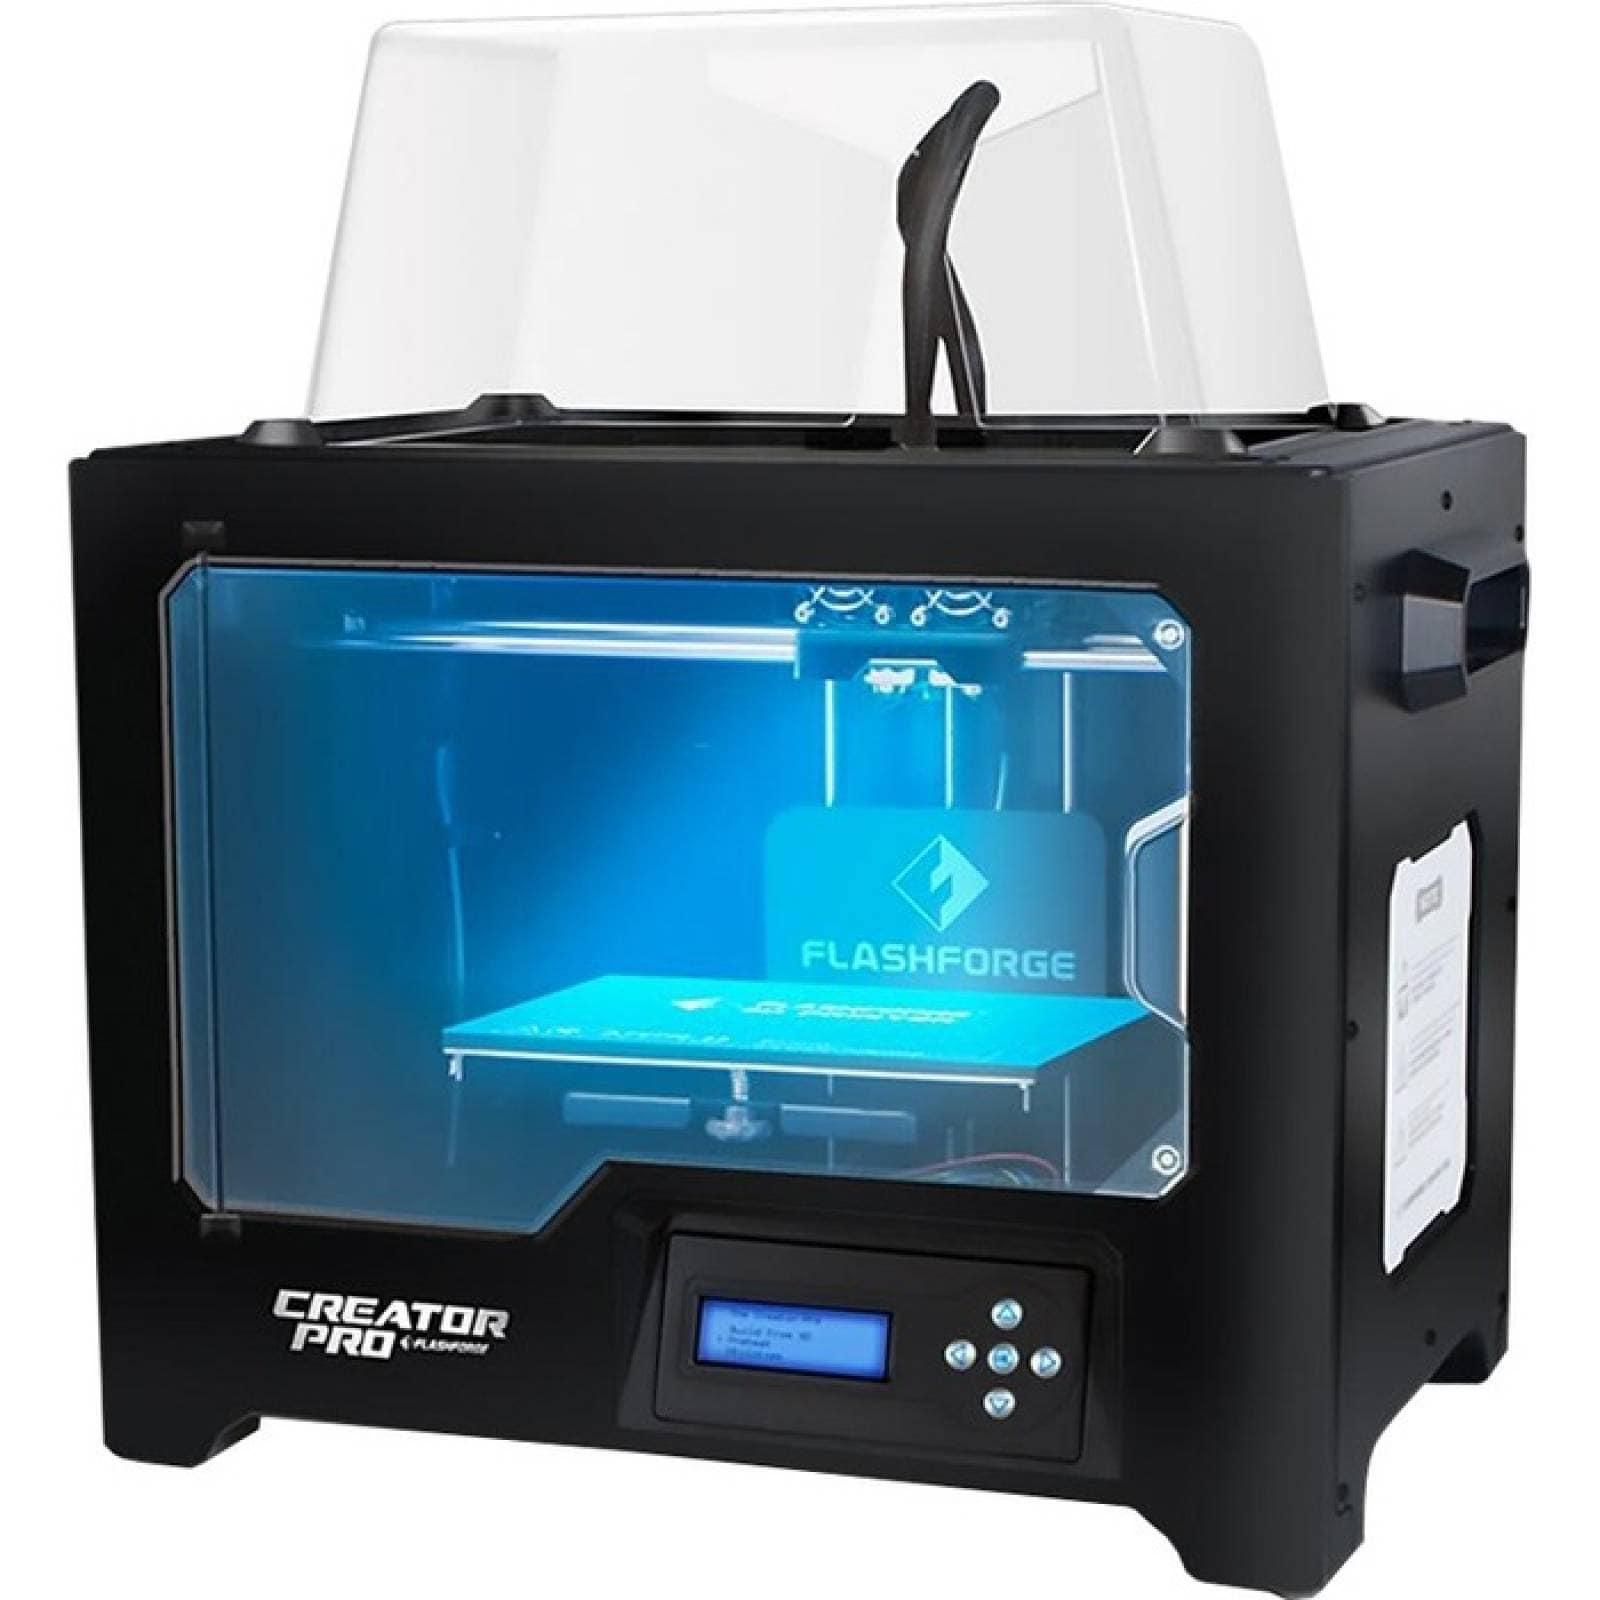 Impresora 3D Flashforge Creator Pro Dual Extrusion